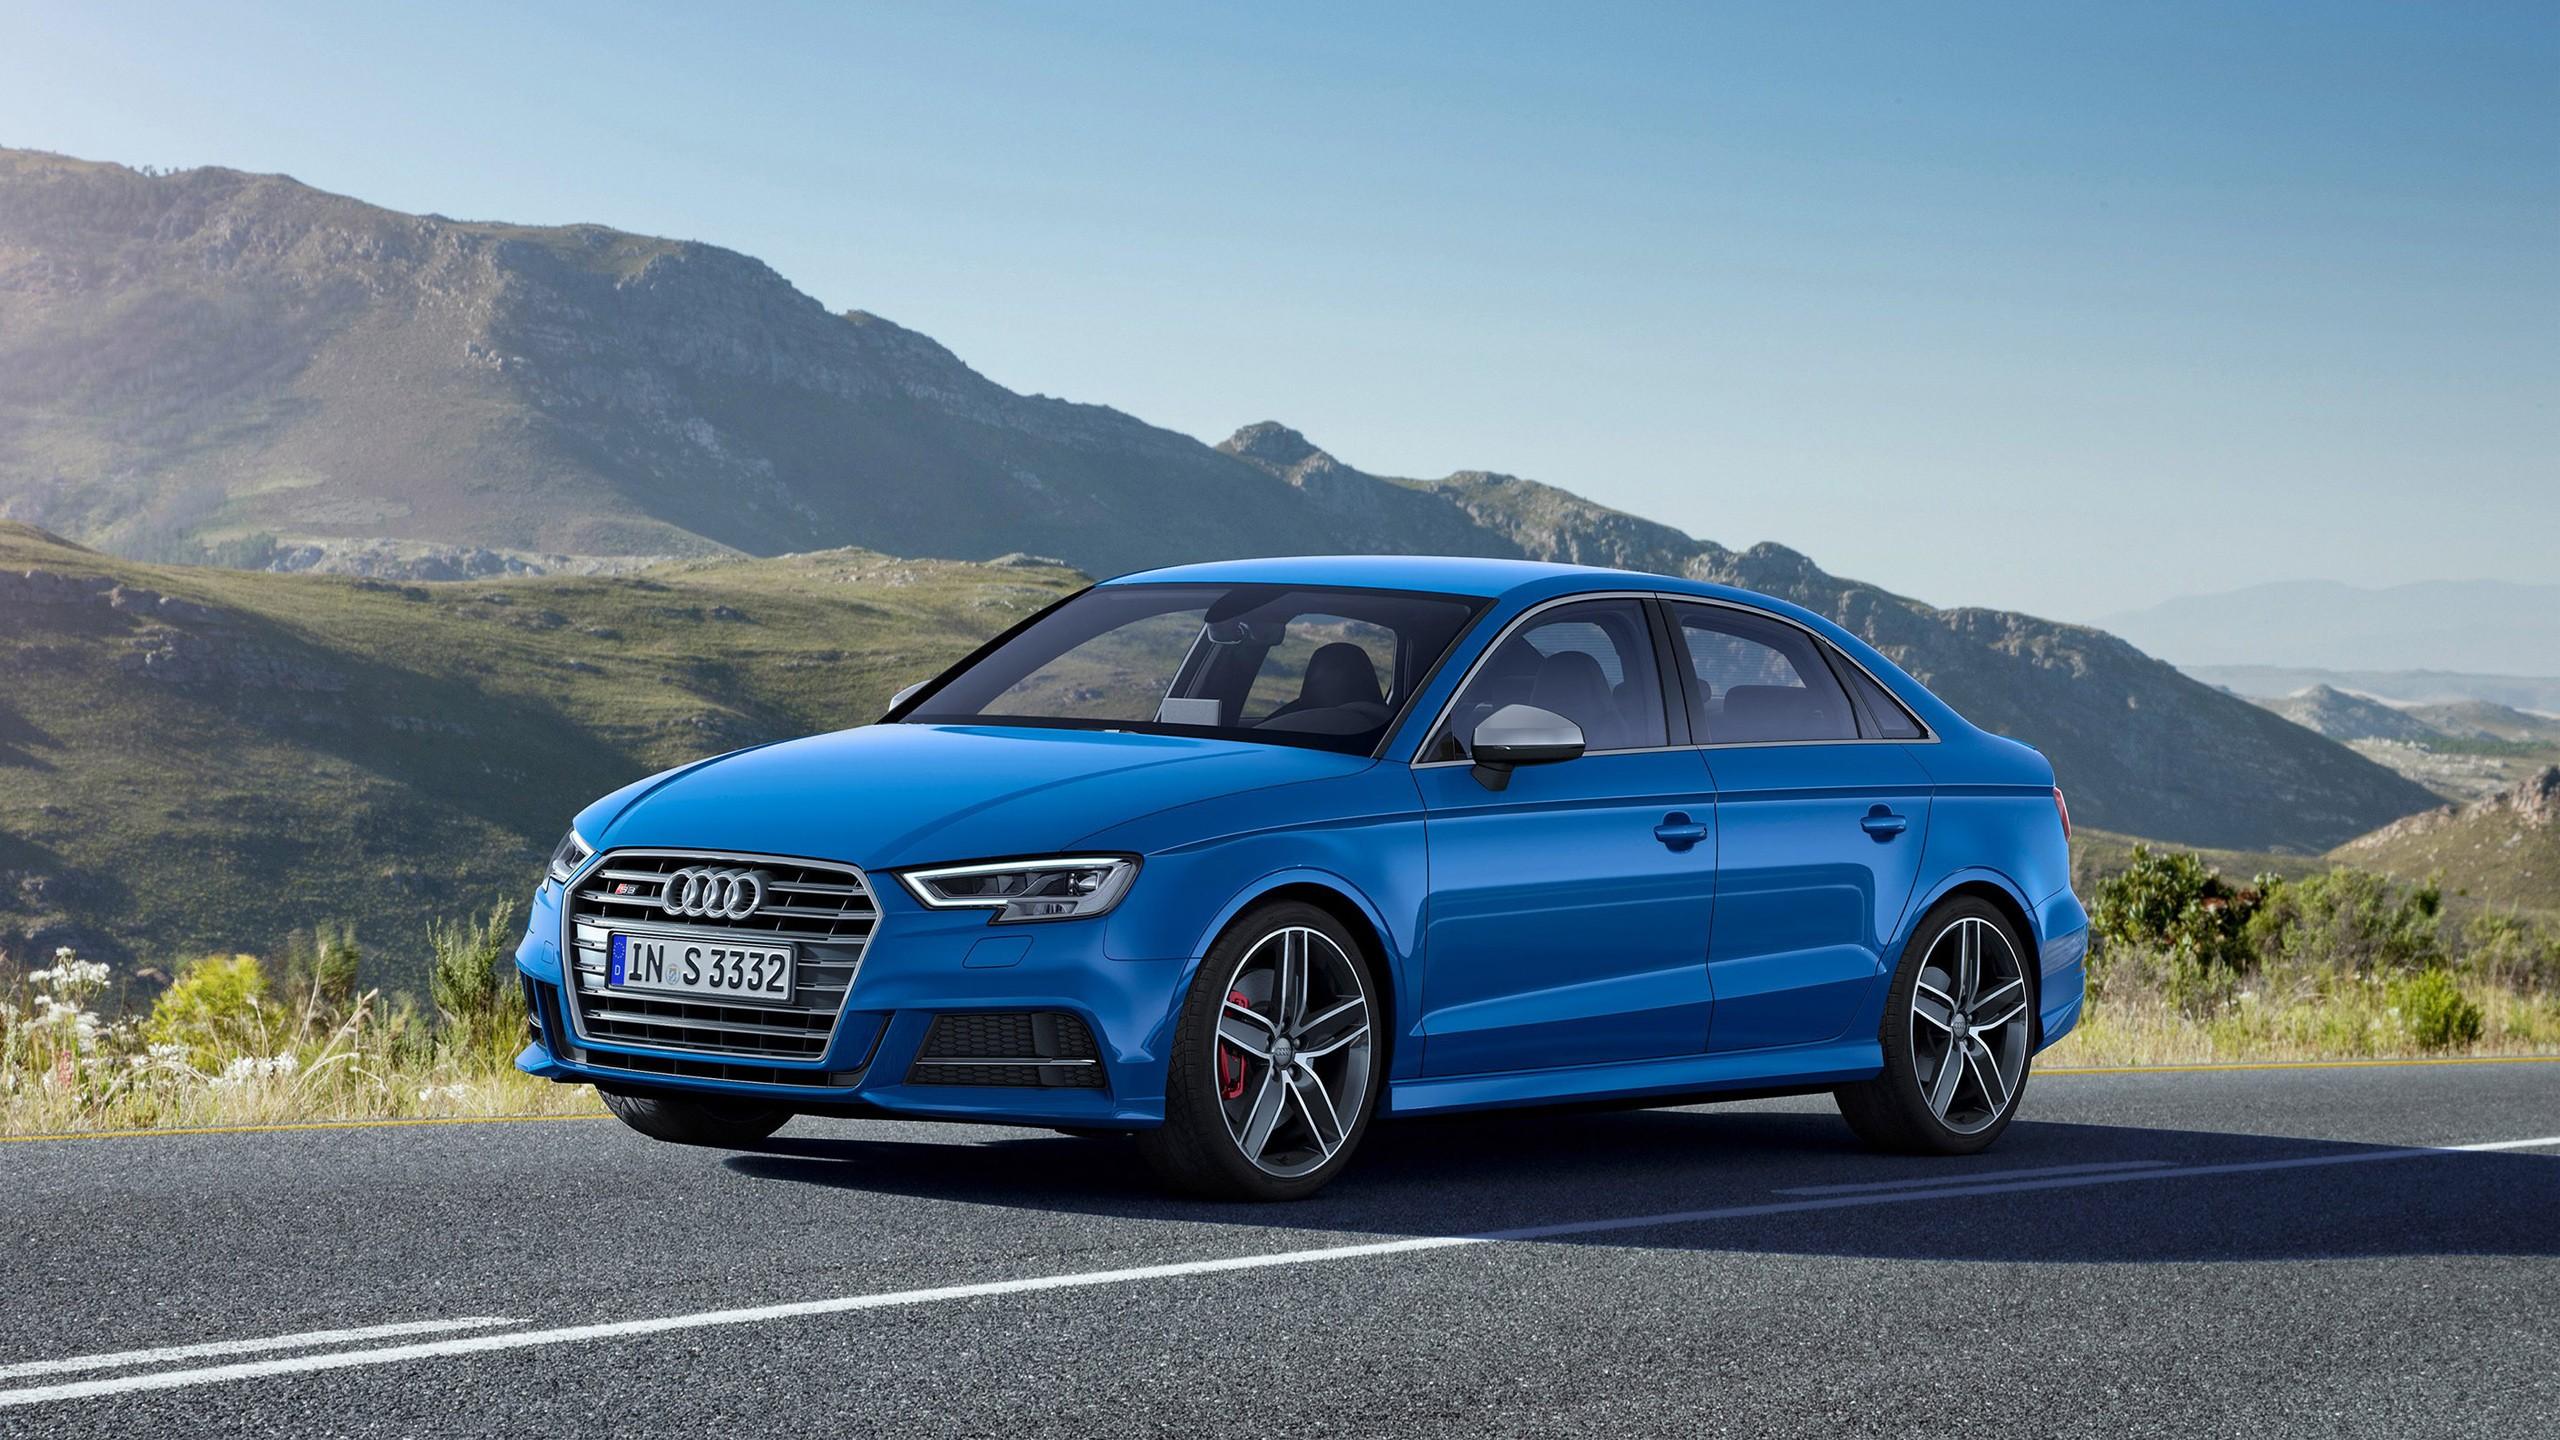 2017 Audi S3 Sedan Wallpaper Hd Car Wallpapers Id 6865